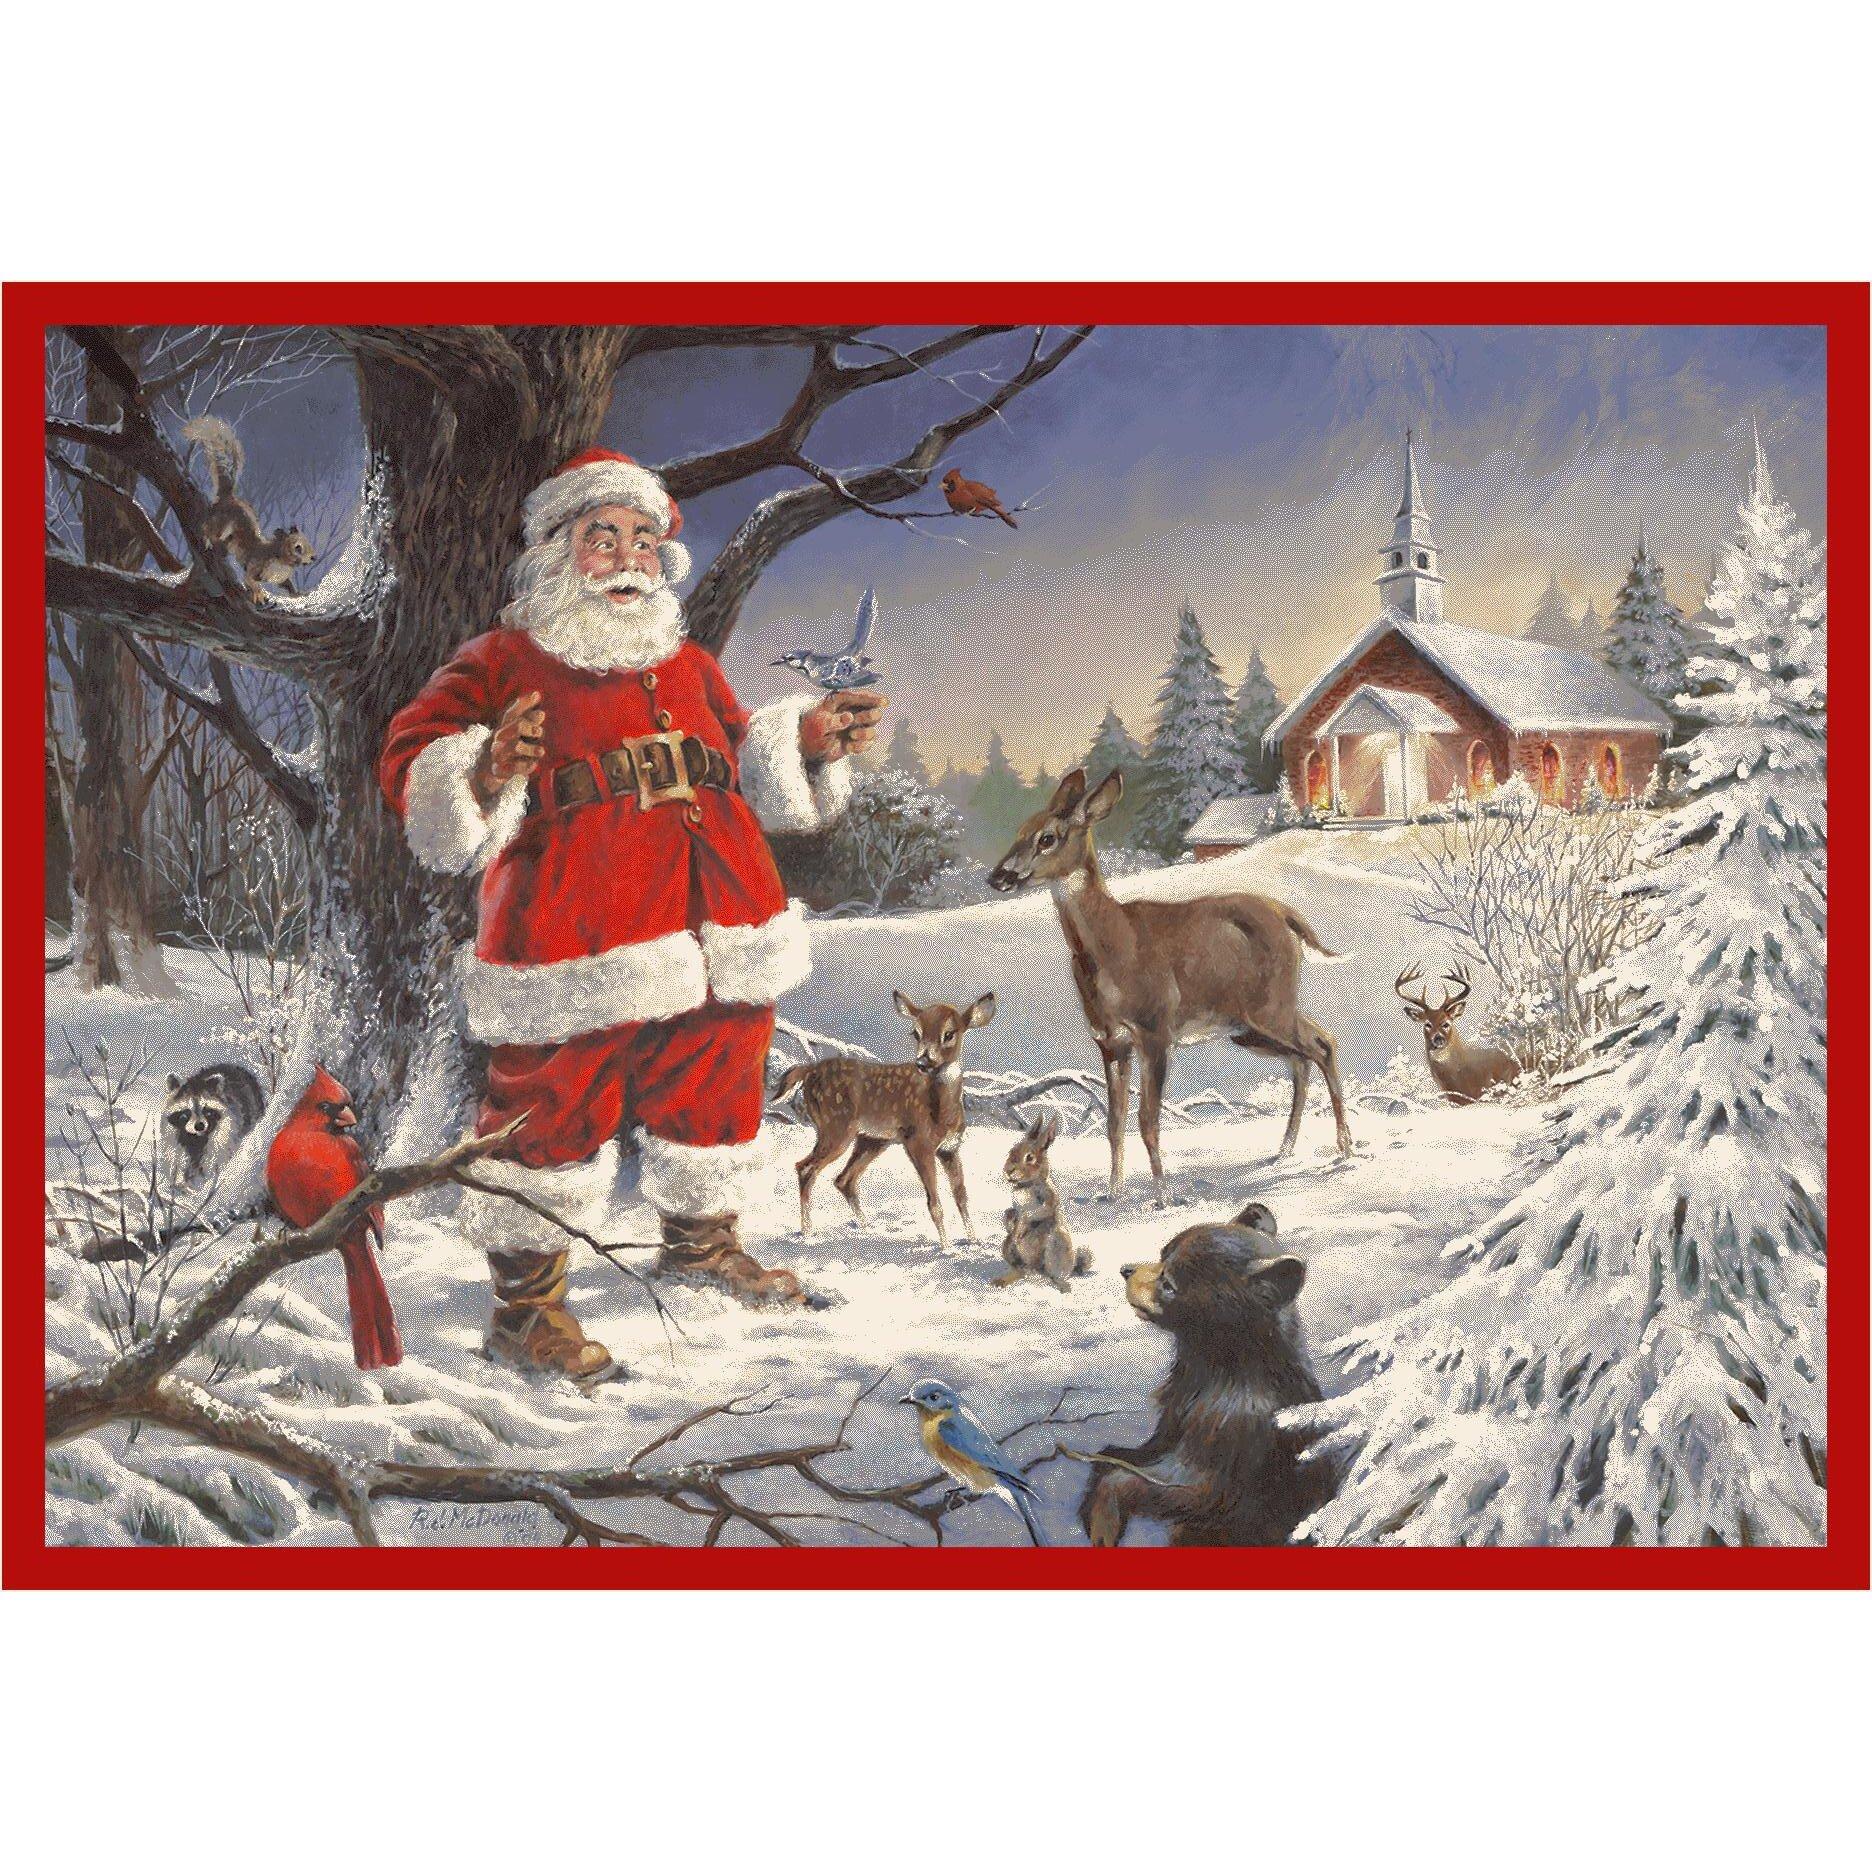 Milliken RJ McDonald Christmas Party Area Rug amp Reviews  : RJ2BMcDonald2BChristmas2BParty2B5345332B20032B2xx2BNovelty2BRug from www.wayfair.com size 1872 x 1872 jpeg 846kB